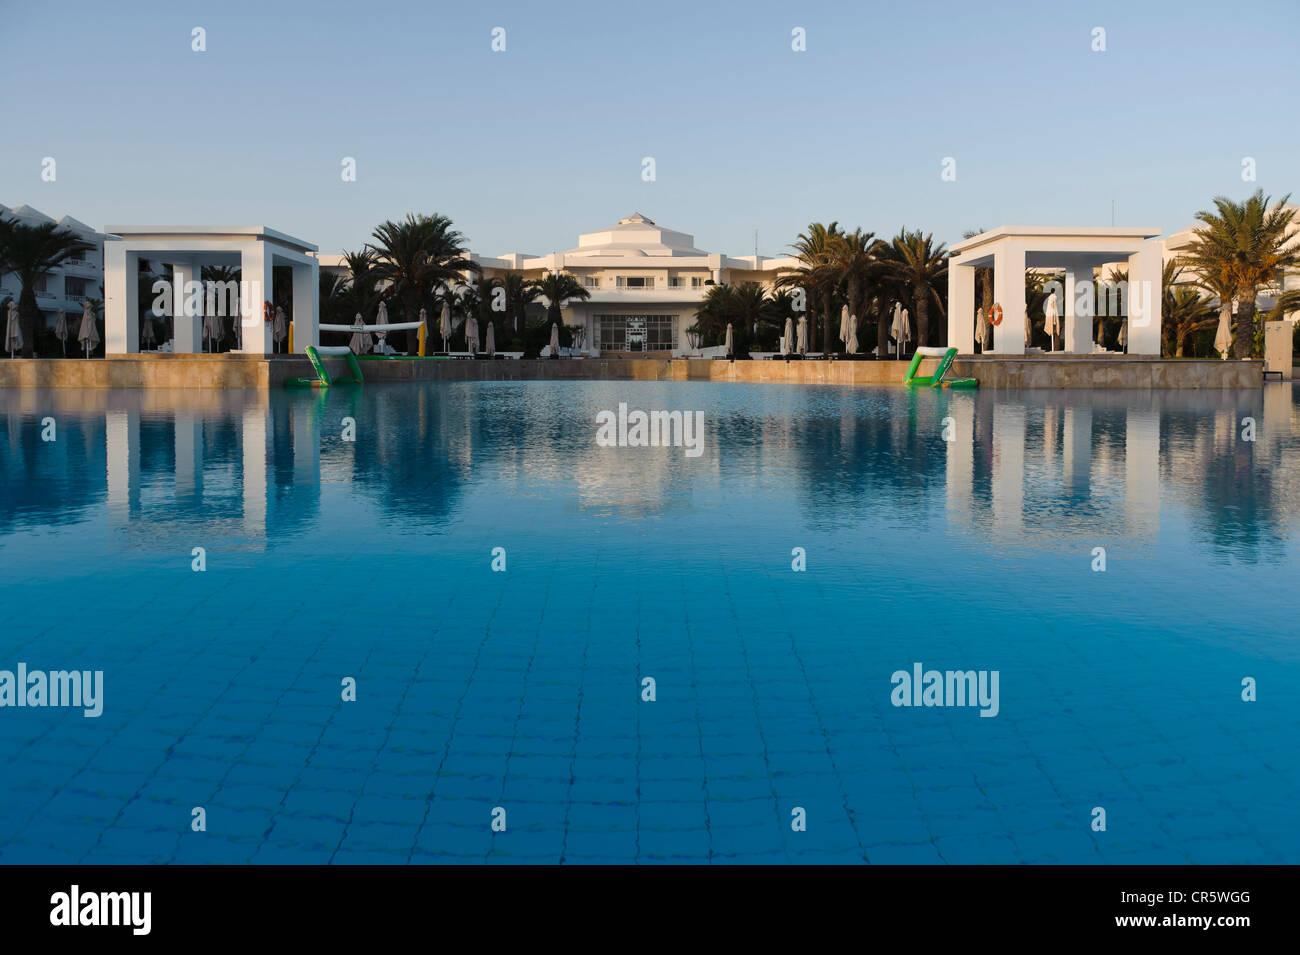 Swimming pool at the Radisson Blu hotel resort, Djerba, Tunisia, Maghreb, North Africa, Africa - Stock Image